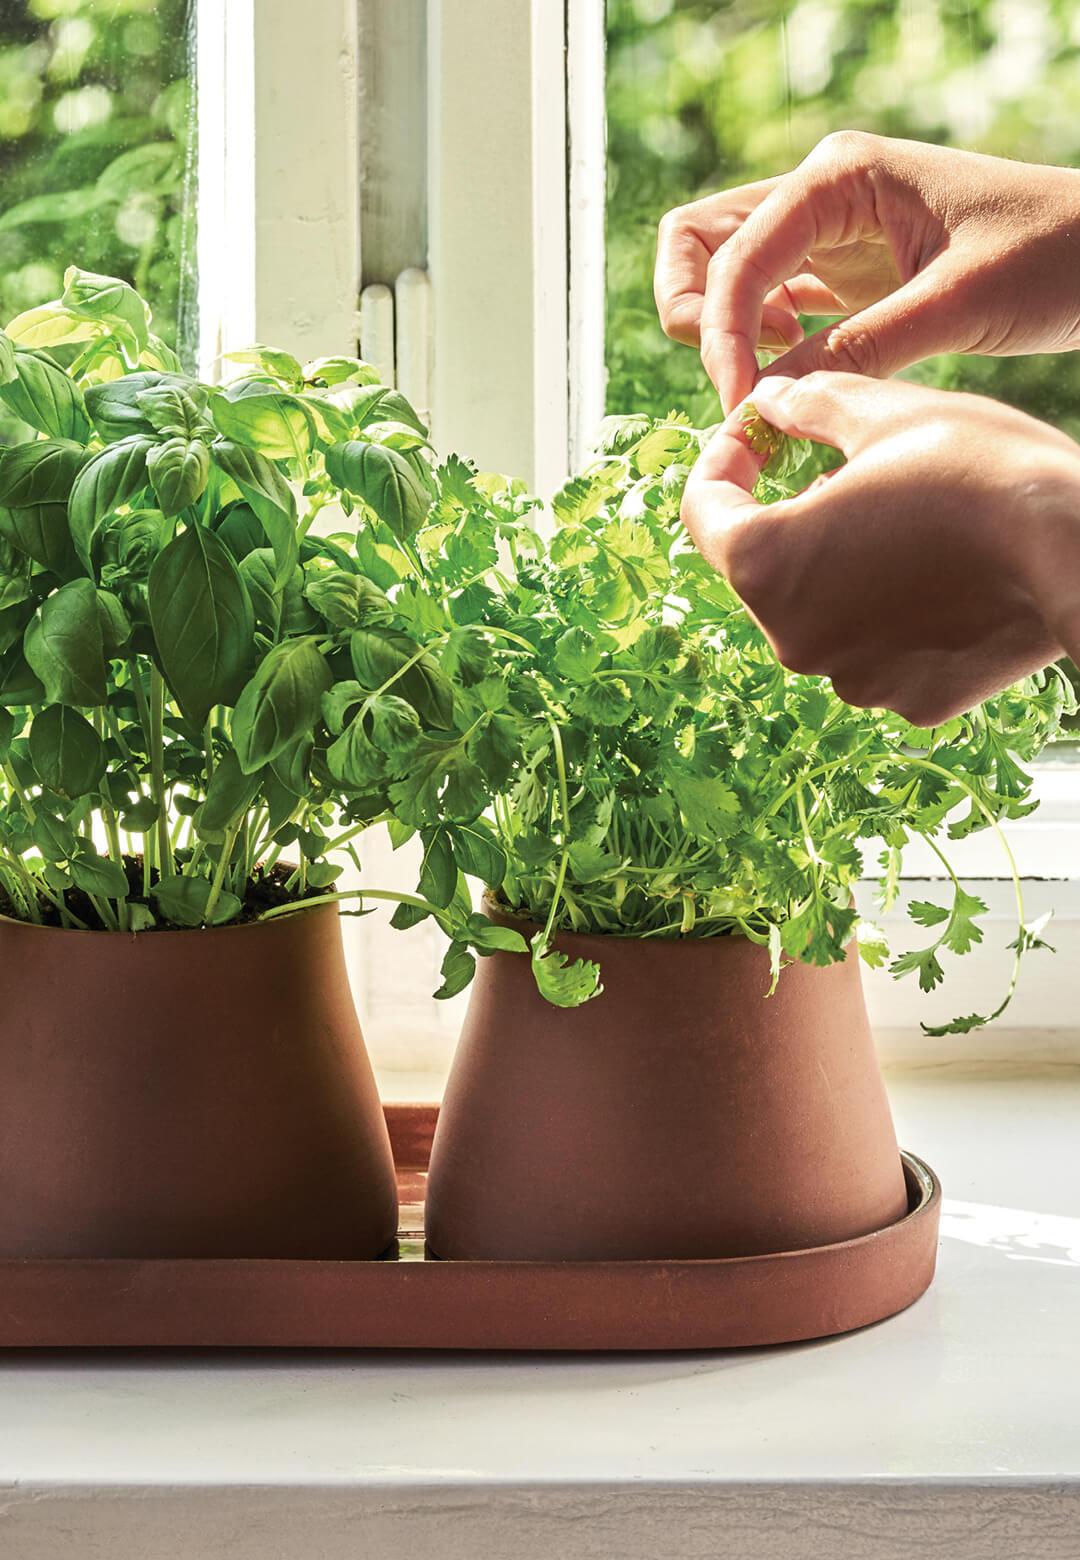 Terra, a nine-piece plant accessory collection designed by Snøhetta for Georg Jensen | Snøhetta designs Terra collection for Georg Jensen | STIRworld